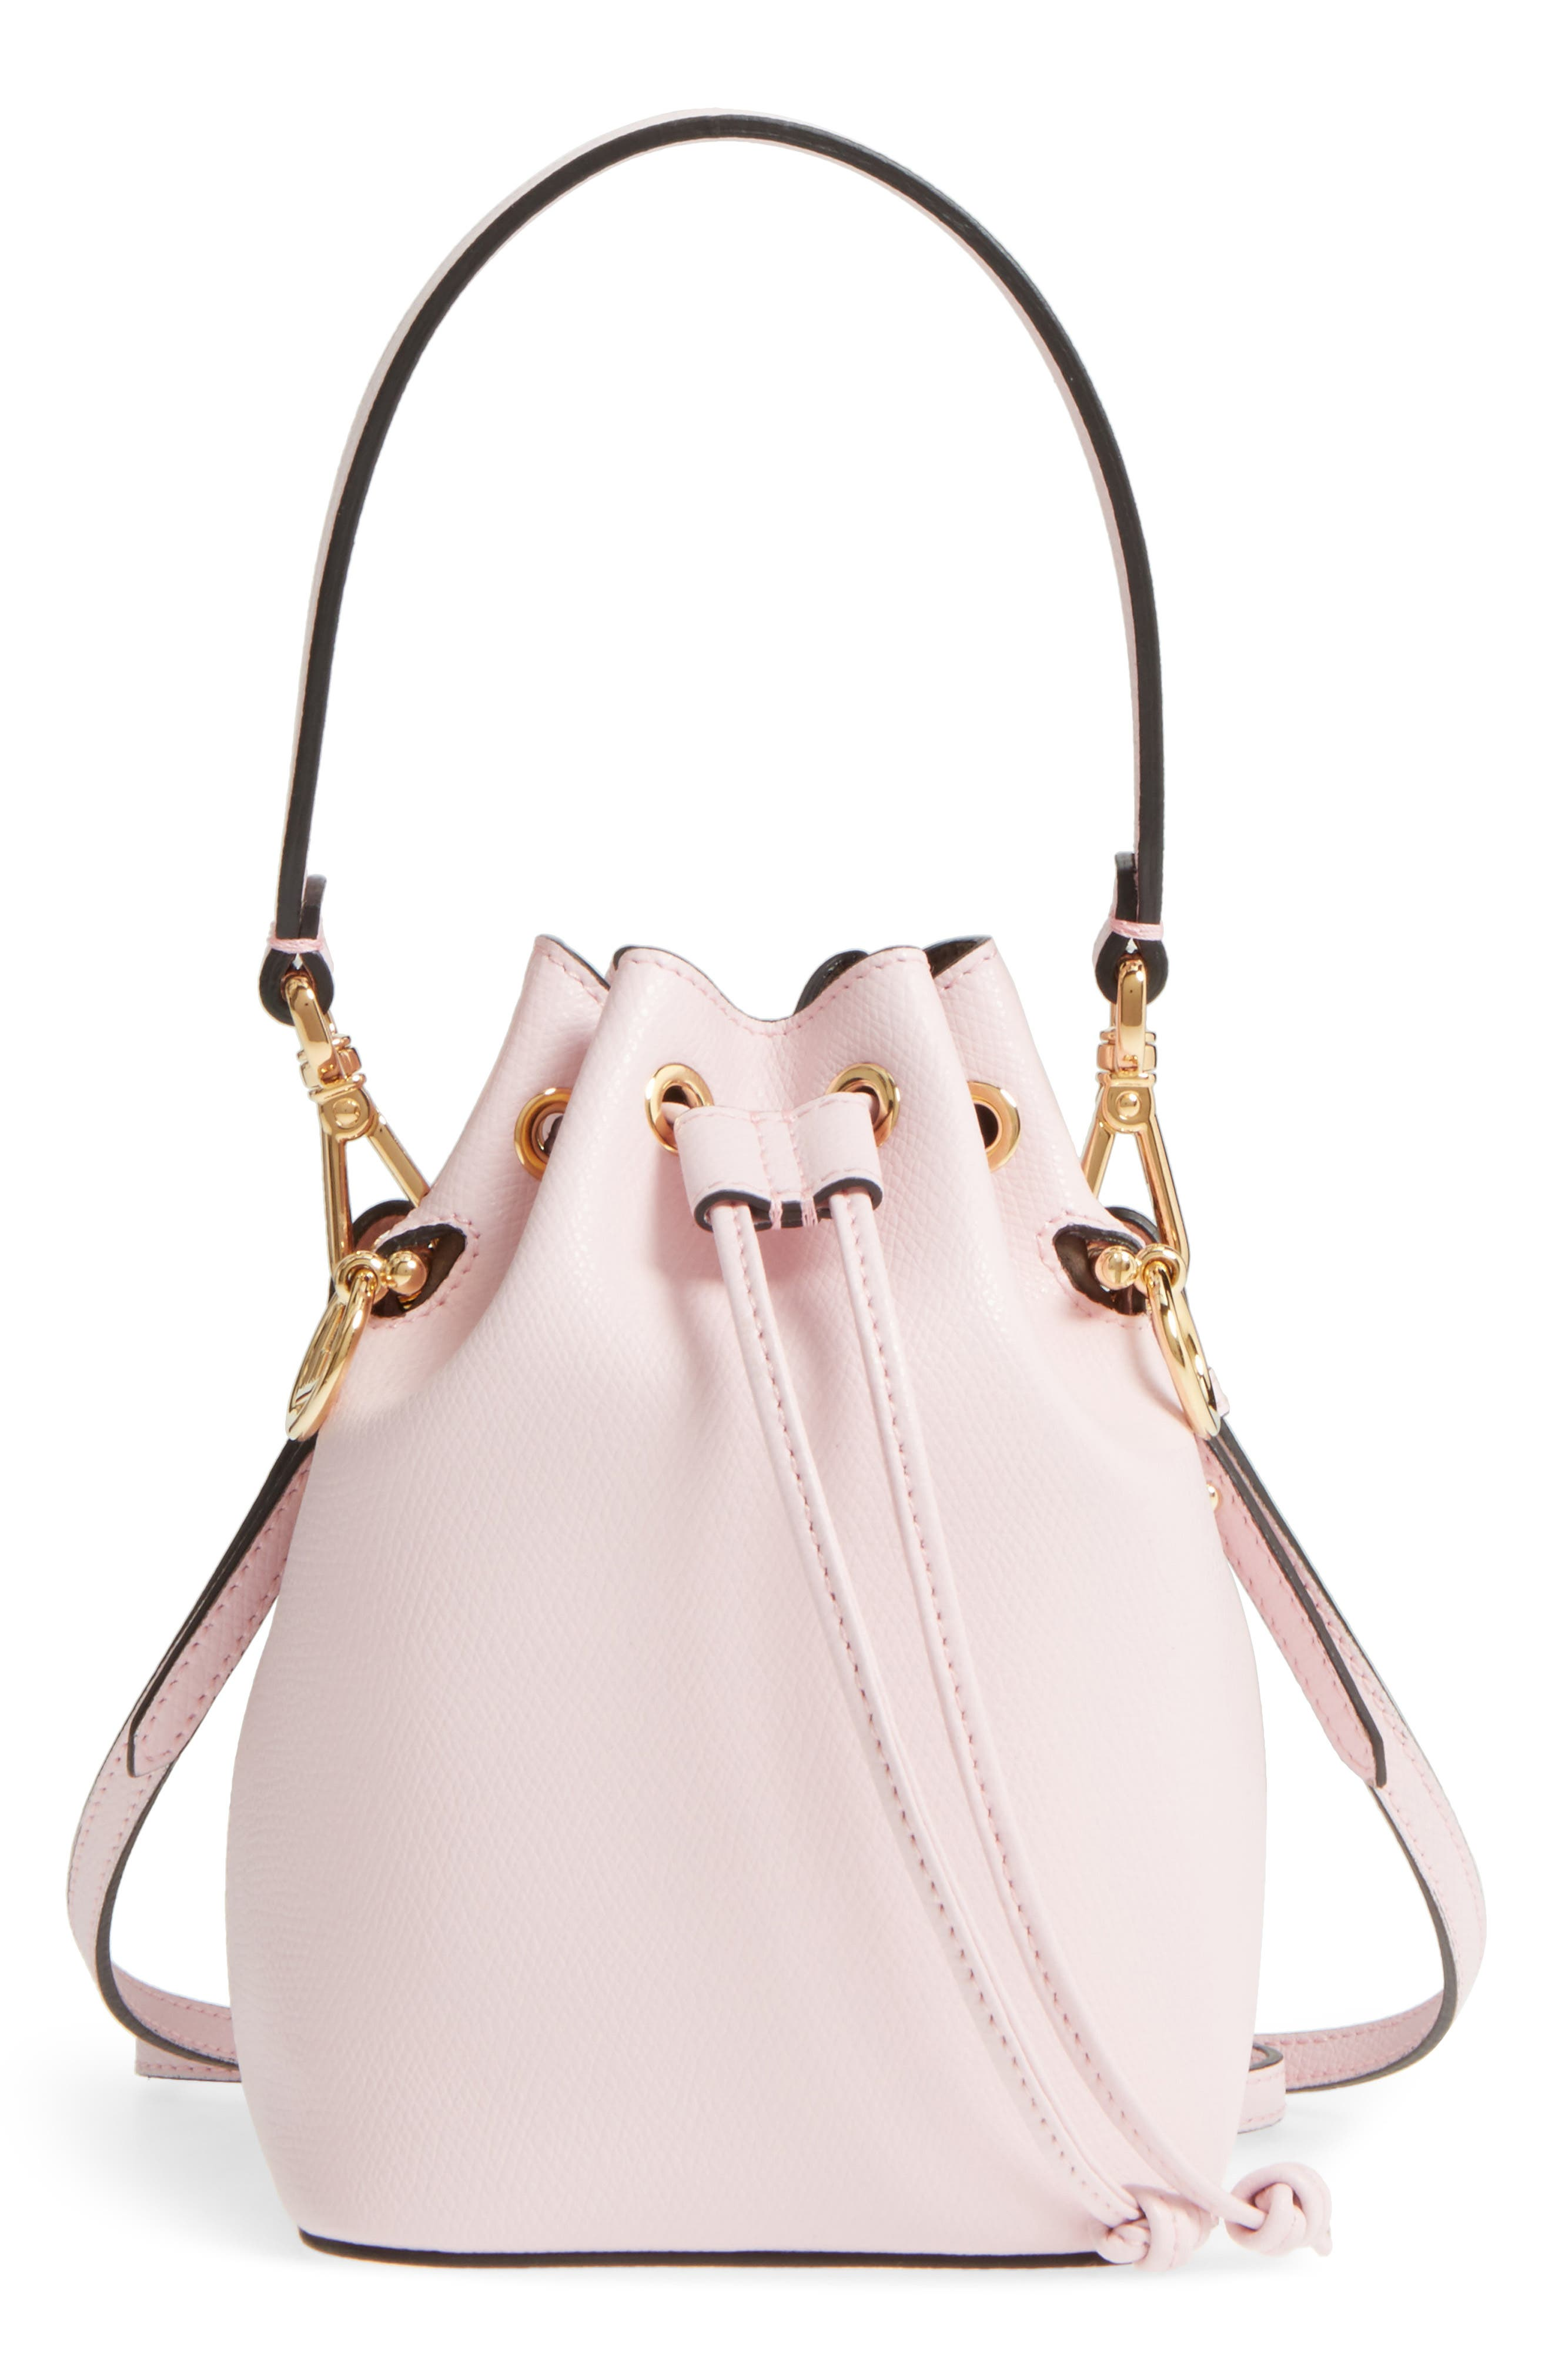 Fendi Mini Leather Bucket Bag